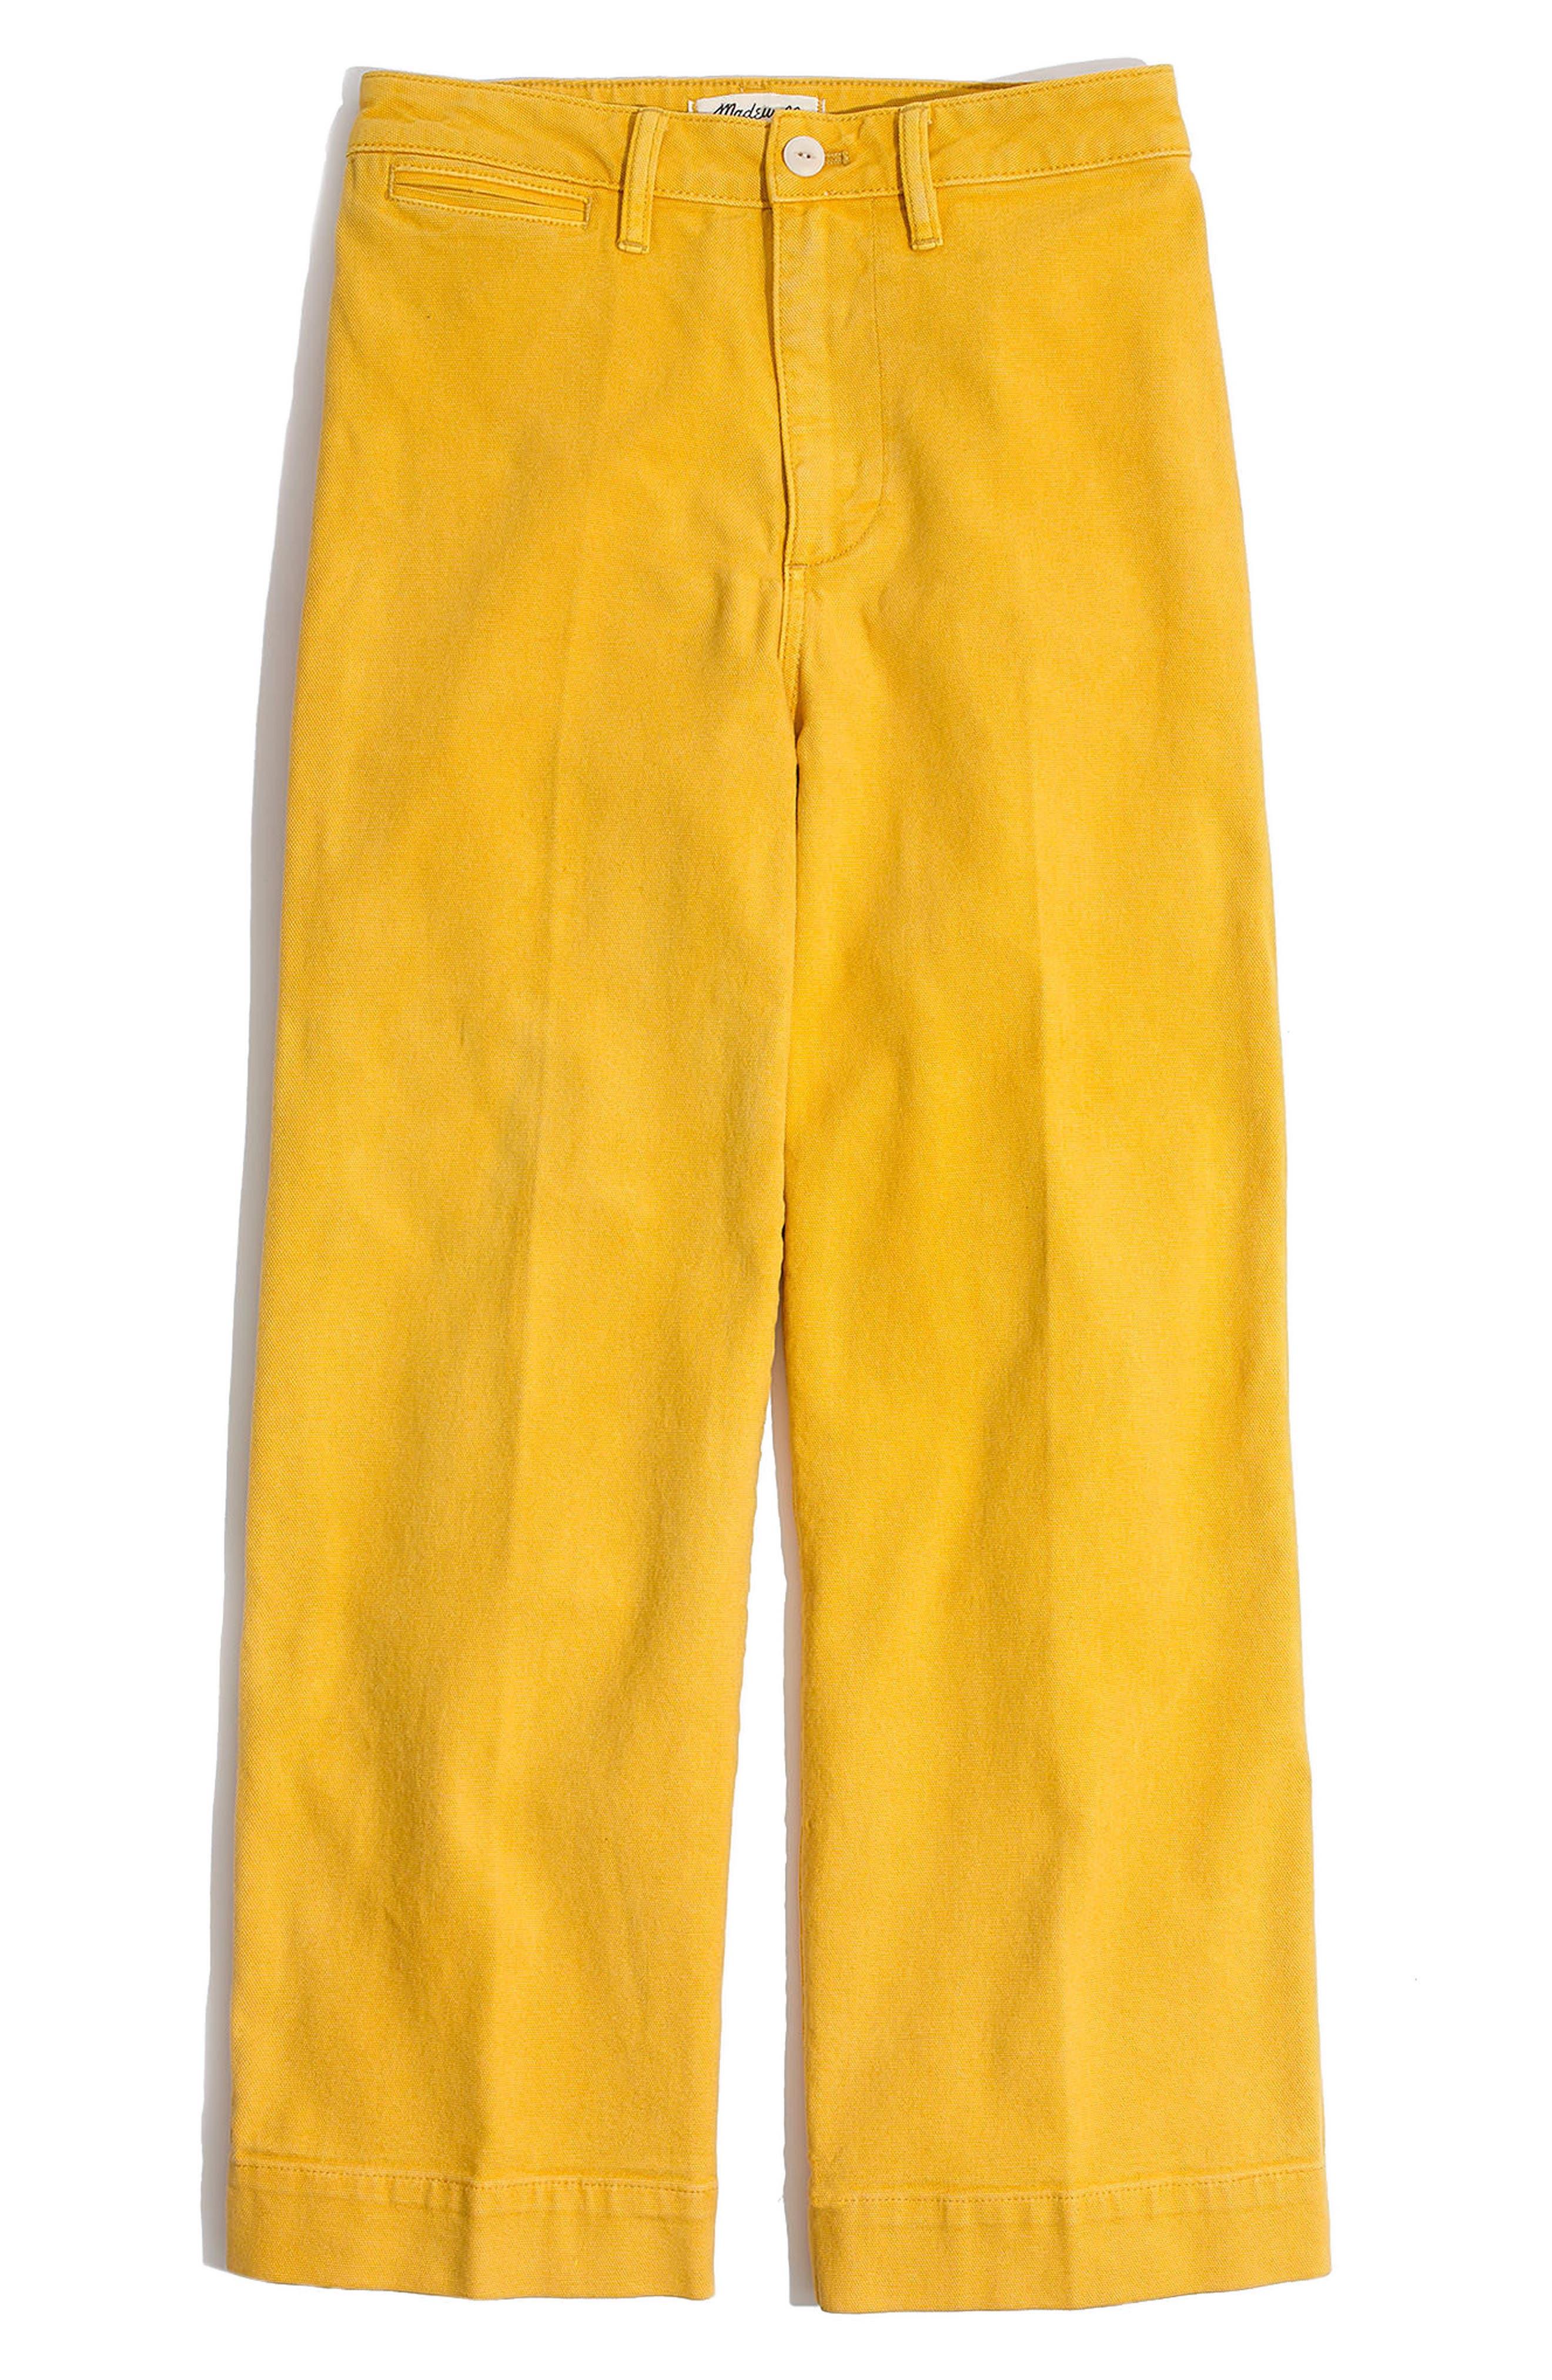 Emmett Crop Wide Leg Pants,                             Main thumbnail 1, color,                             Greek Gold